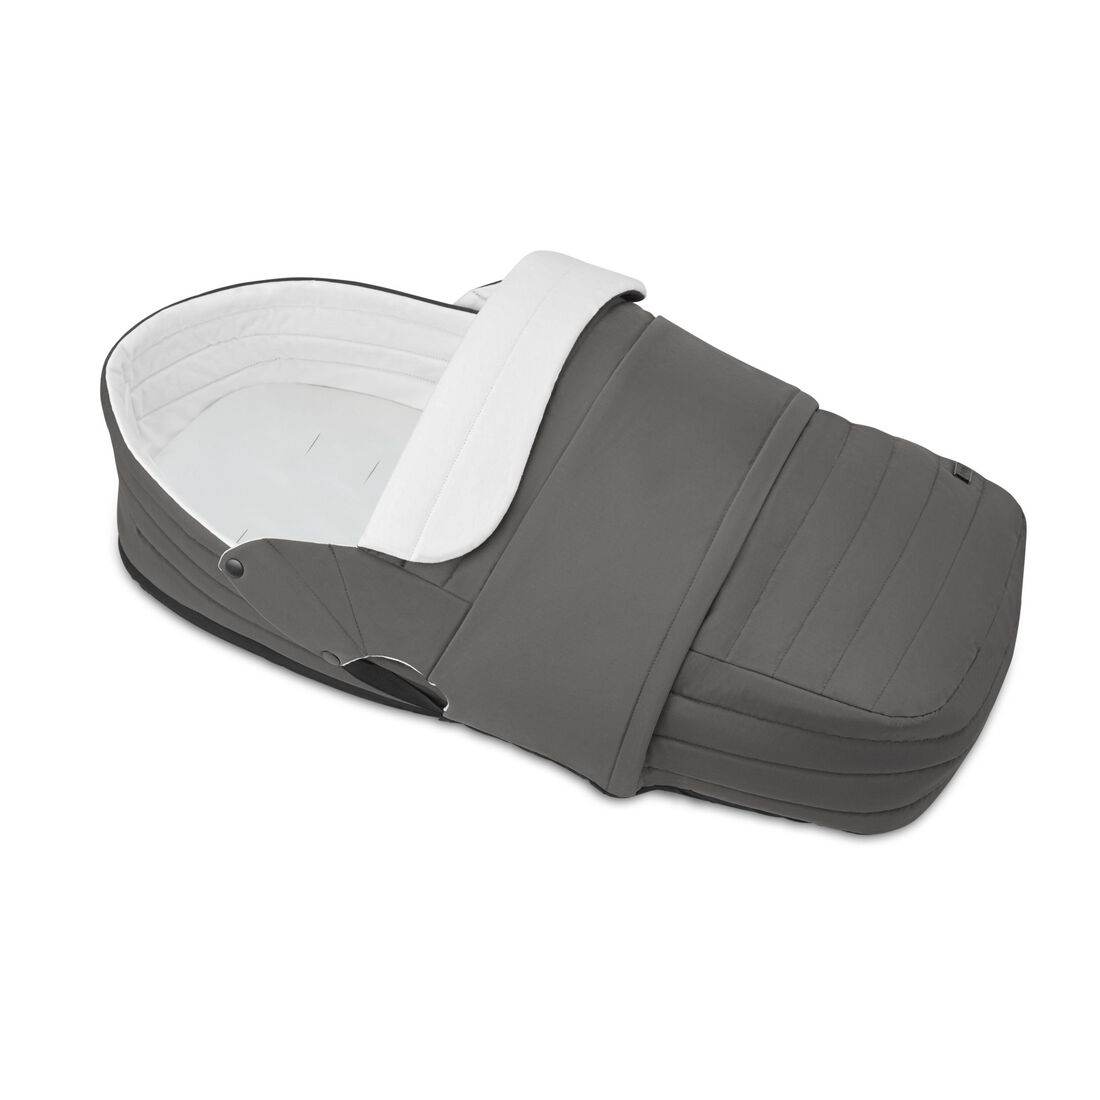 CYBEX Lite Cot - Soho Grey in Soho Grey large image number 3